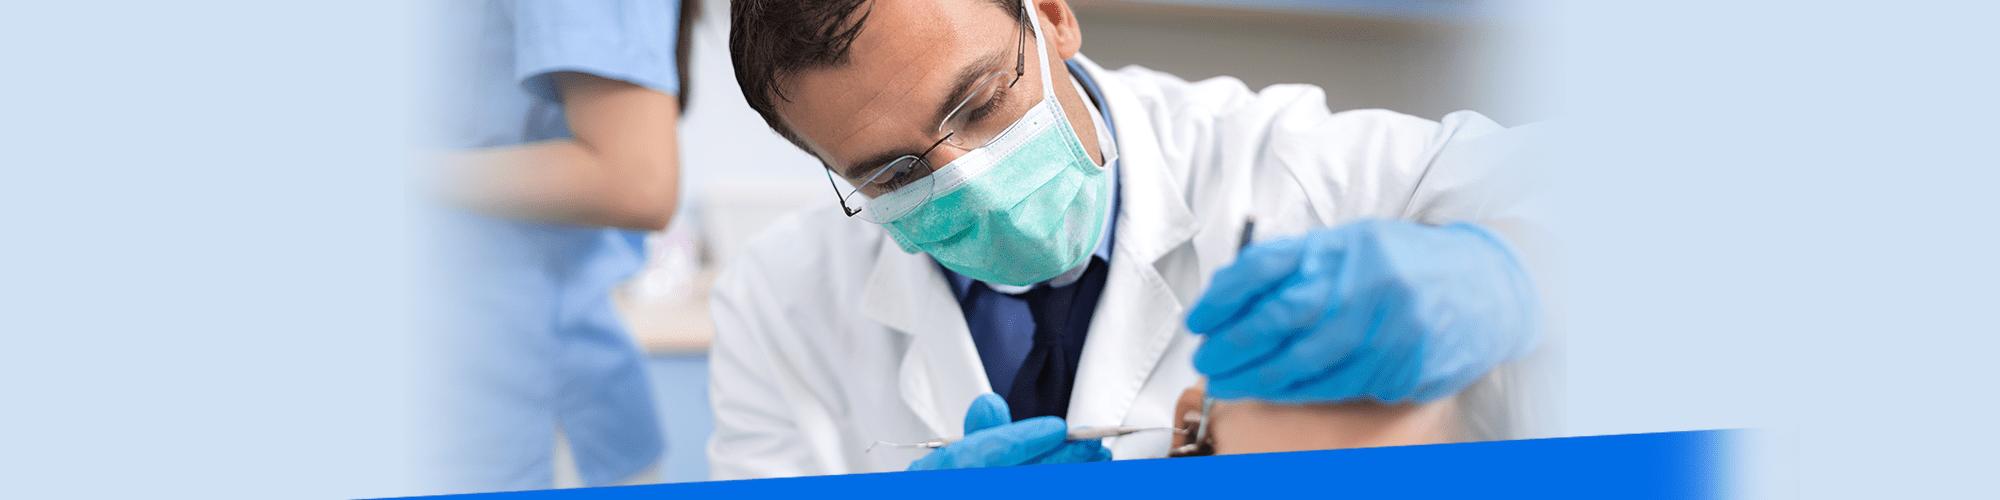 Slider Körperschaften - VDDS - Verband Deutscher Dental-Software Unternehmen e.V.